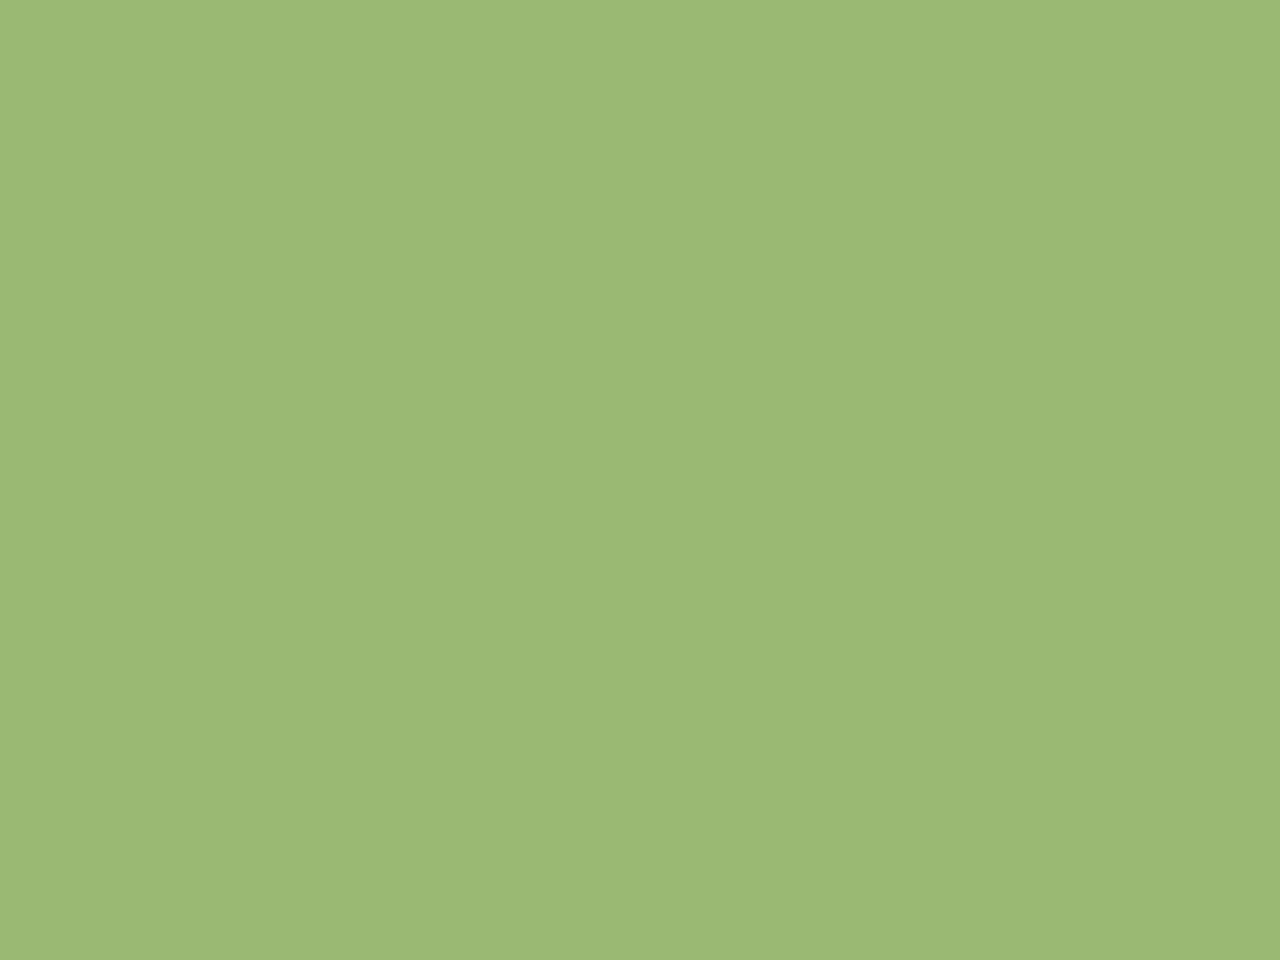 1280x960 Olivine Solid Color Background